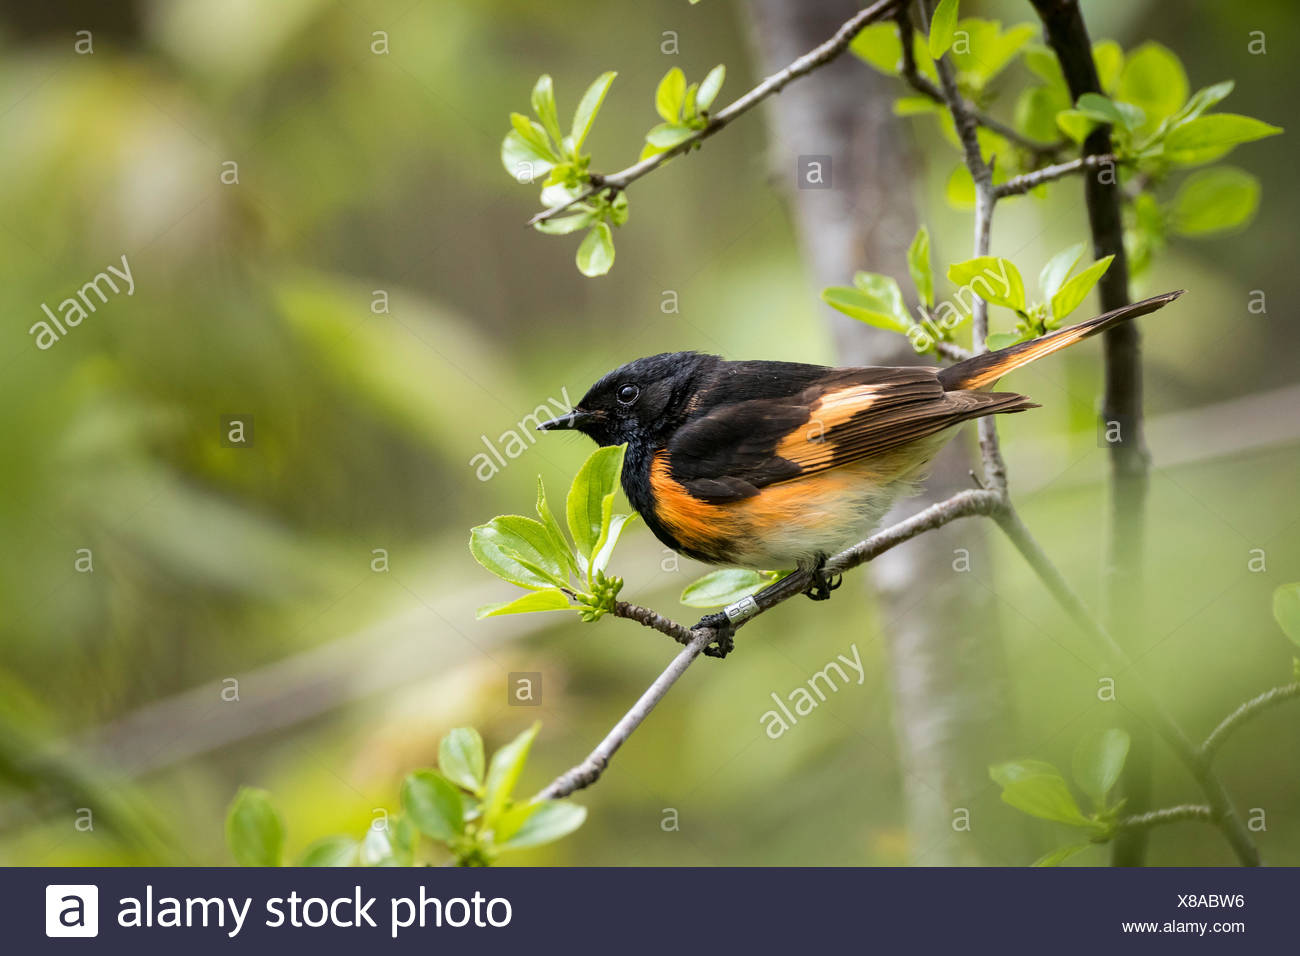 Male American Redstart (Setophaga ruticilla), Prince Edward Point National Wildlife Area, Ontario, Canada Stock Photo